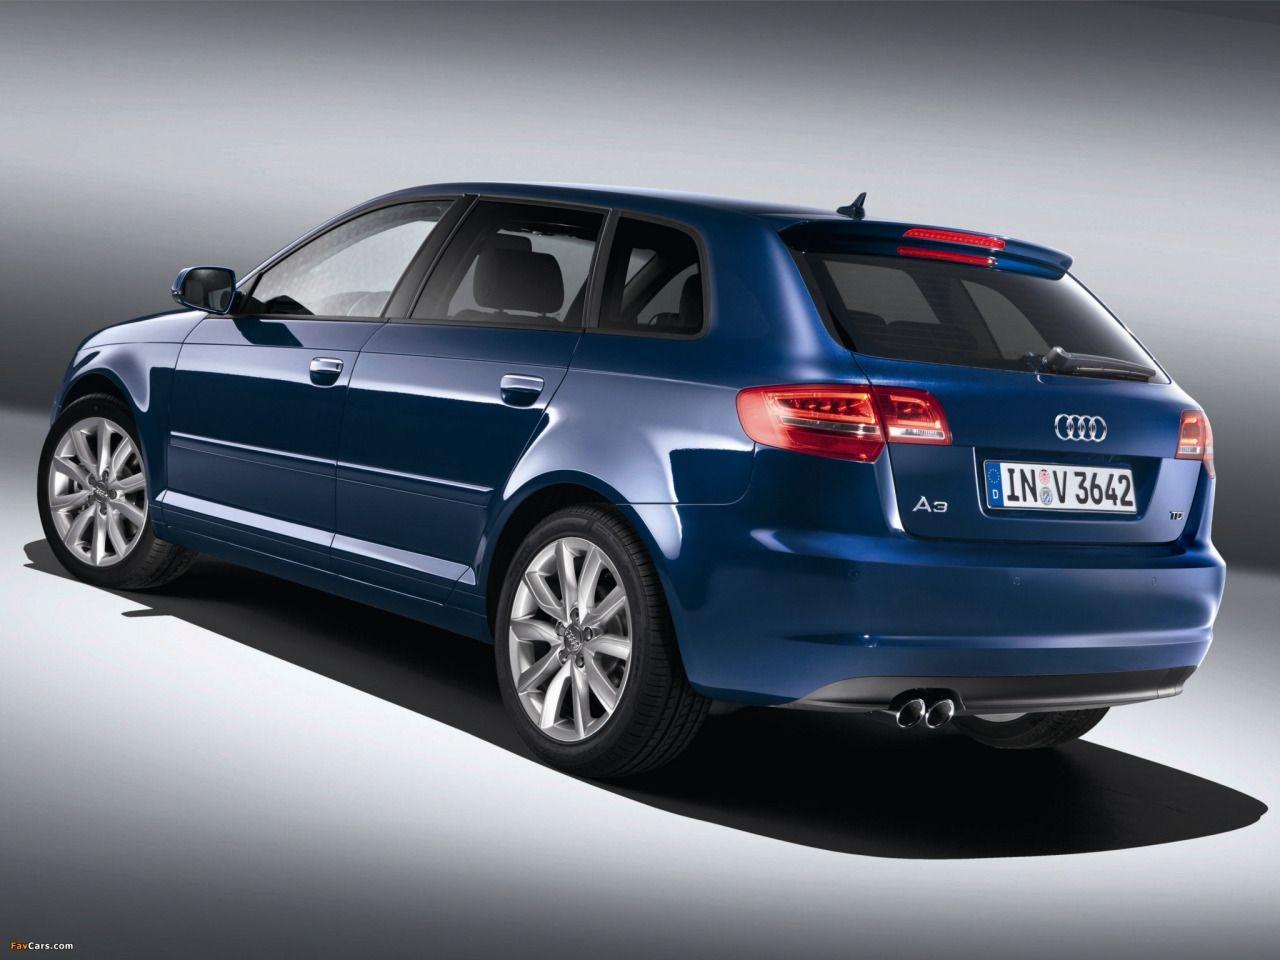 Audi A3 Sportback TDI 8PA (2010) Voiture